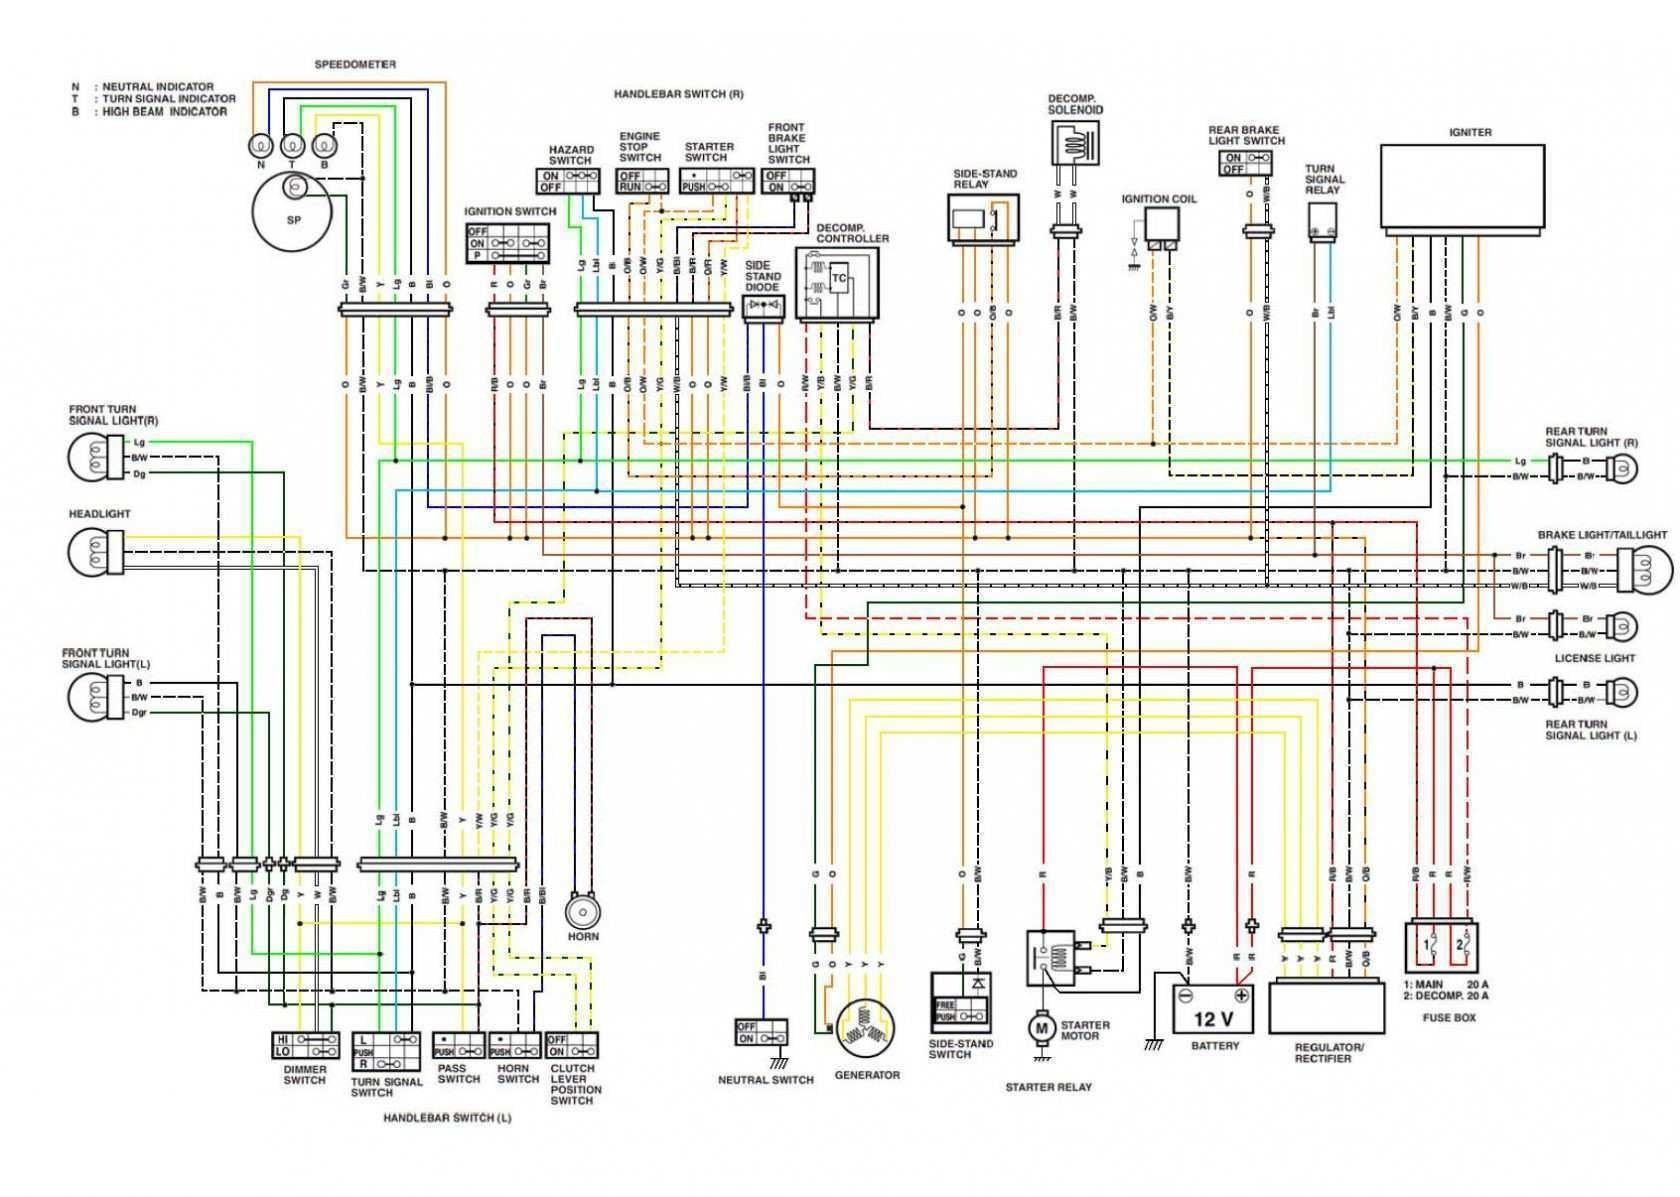 1970 Harley Shovelhead Wiring Schematic Diagram] 1981 Flh Ignition Wiring Diagram Full Version Hd Of 1970 Harley Shovelhead Wiring Schematic